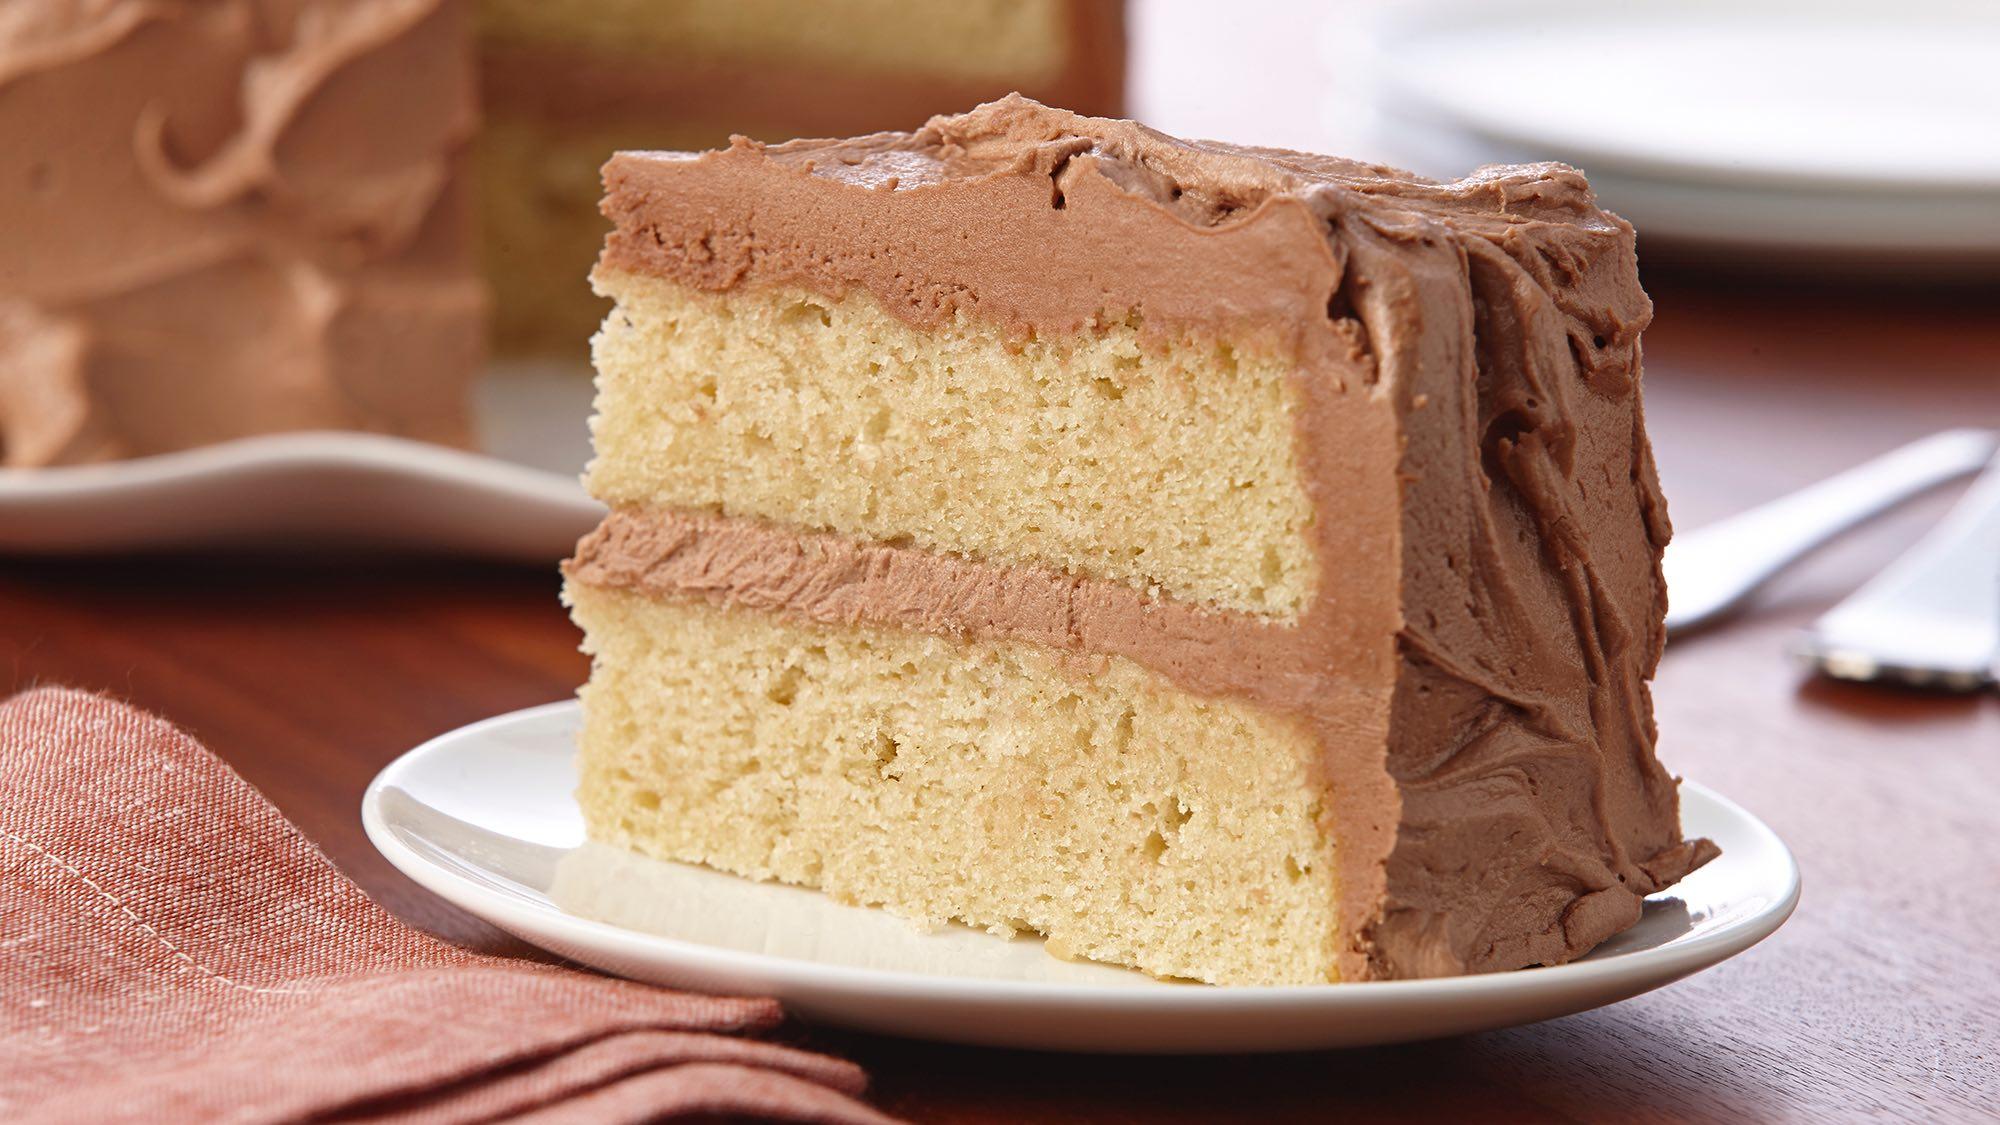 gluten-free-vanilla-cake-with-chocolate-frosting.jpg